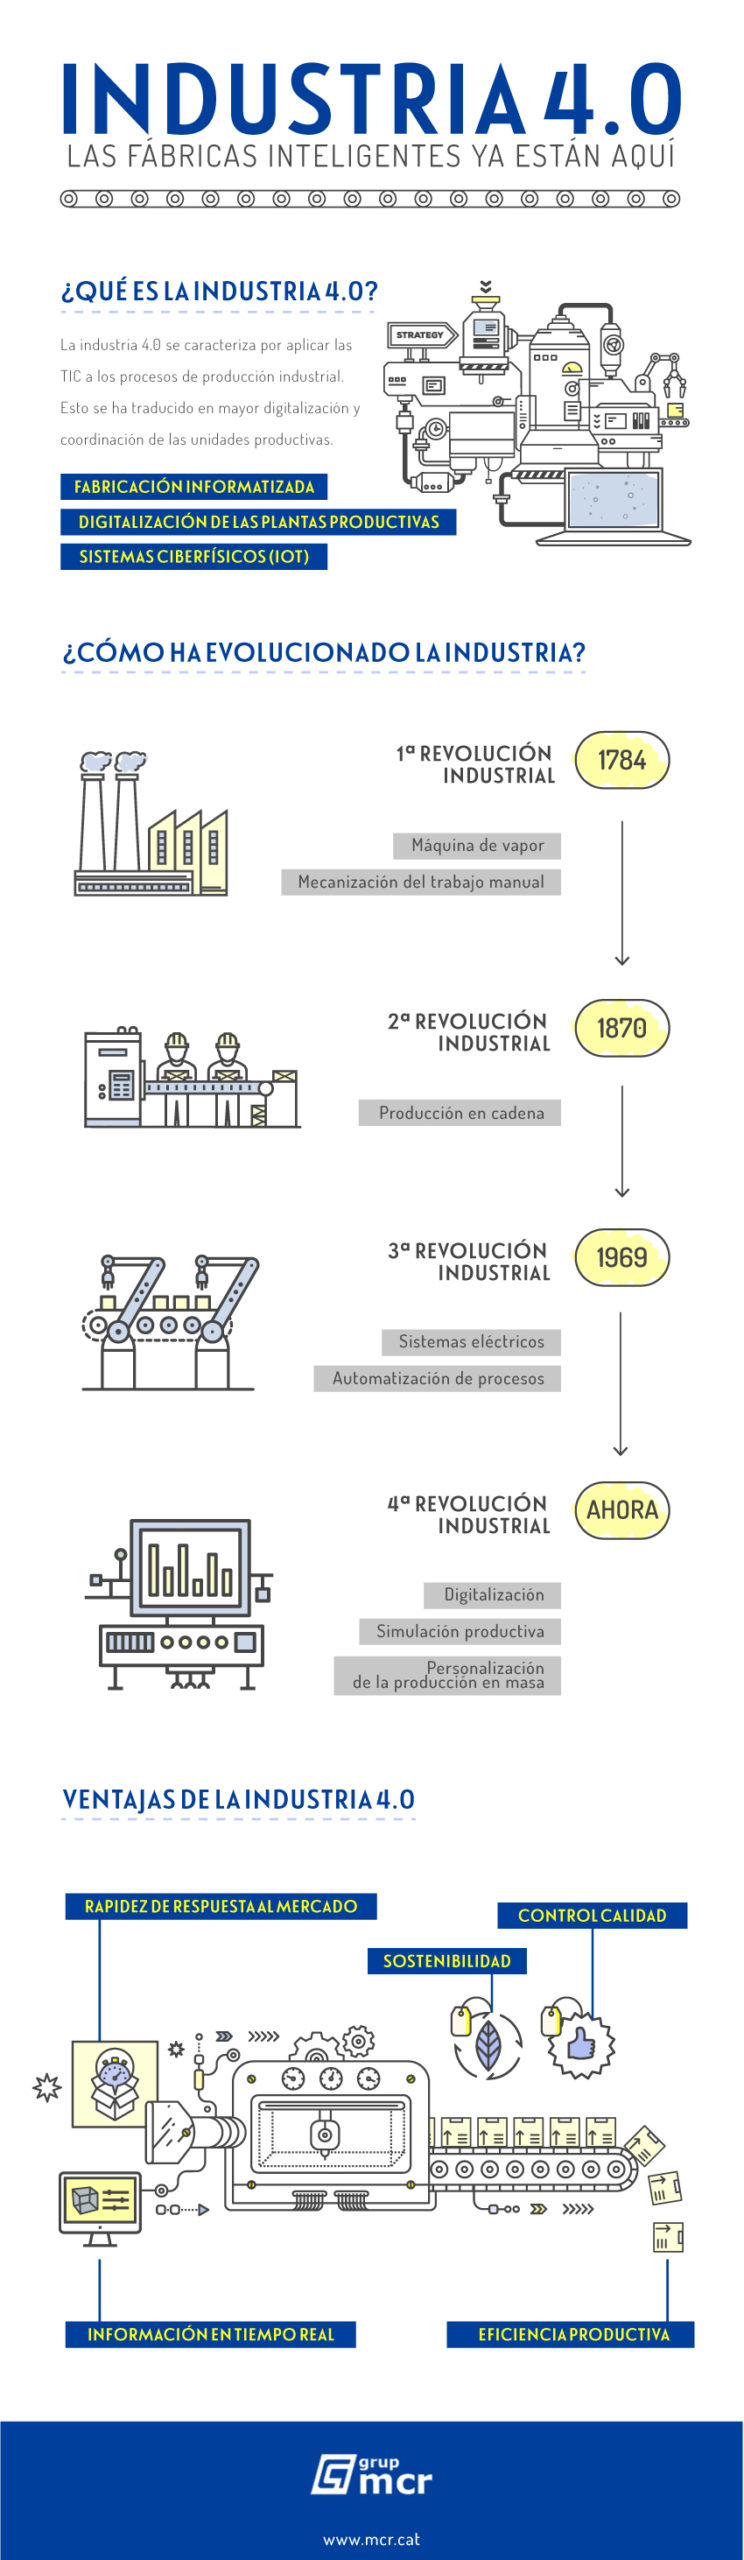 imagen infografia MCR Industria 4.0